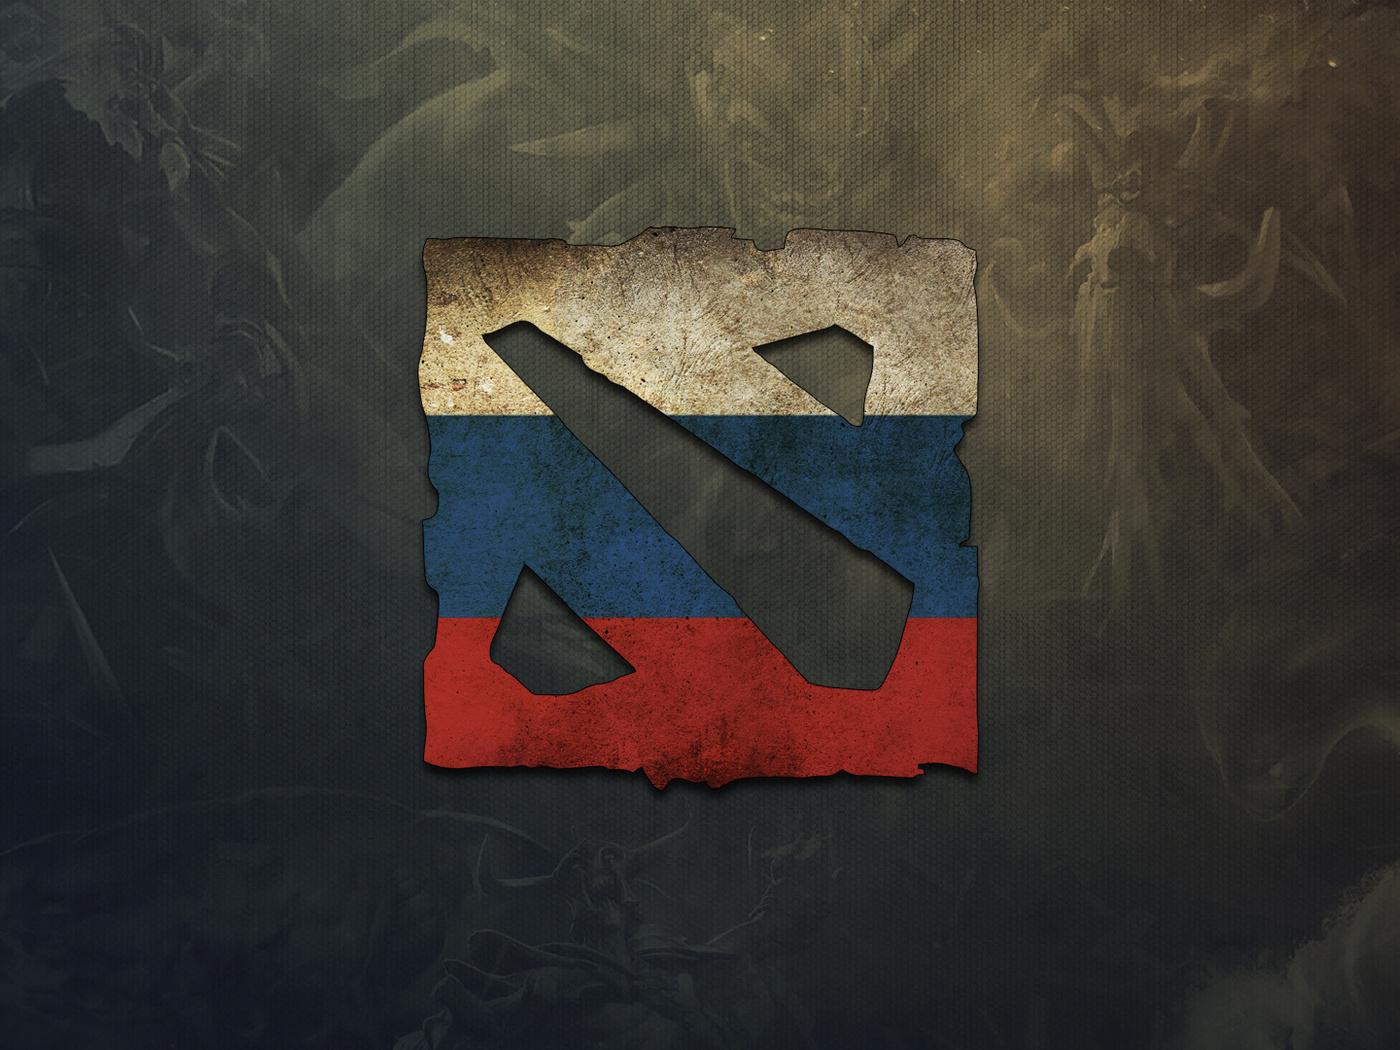 russia, Dota 2, game, игра, логотип, logo, россия, дота 2